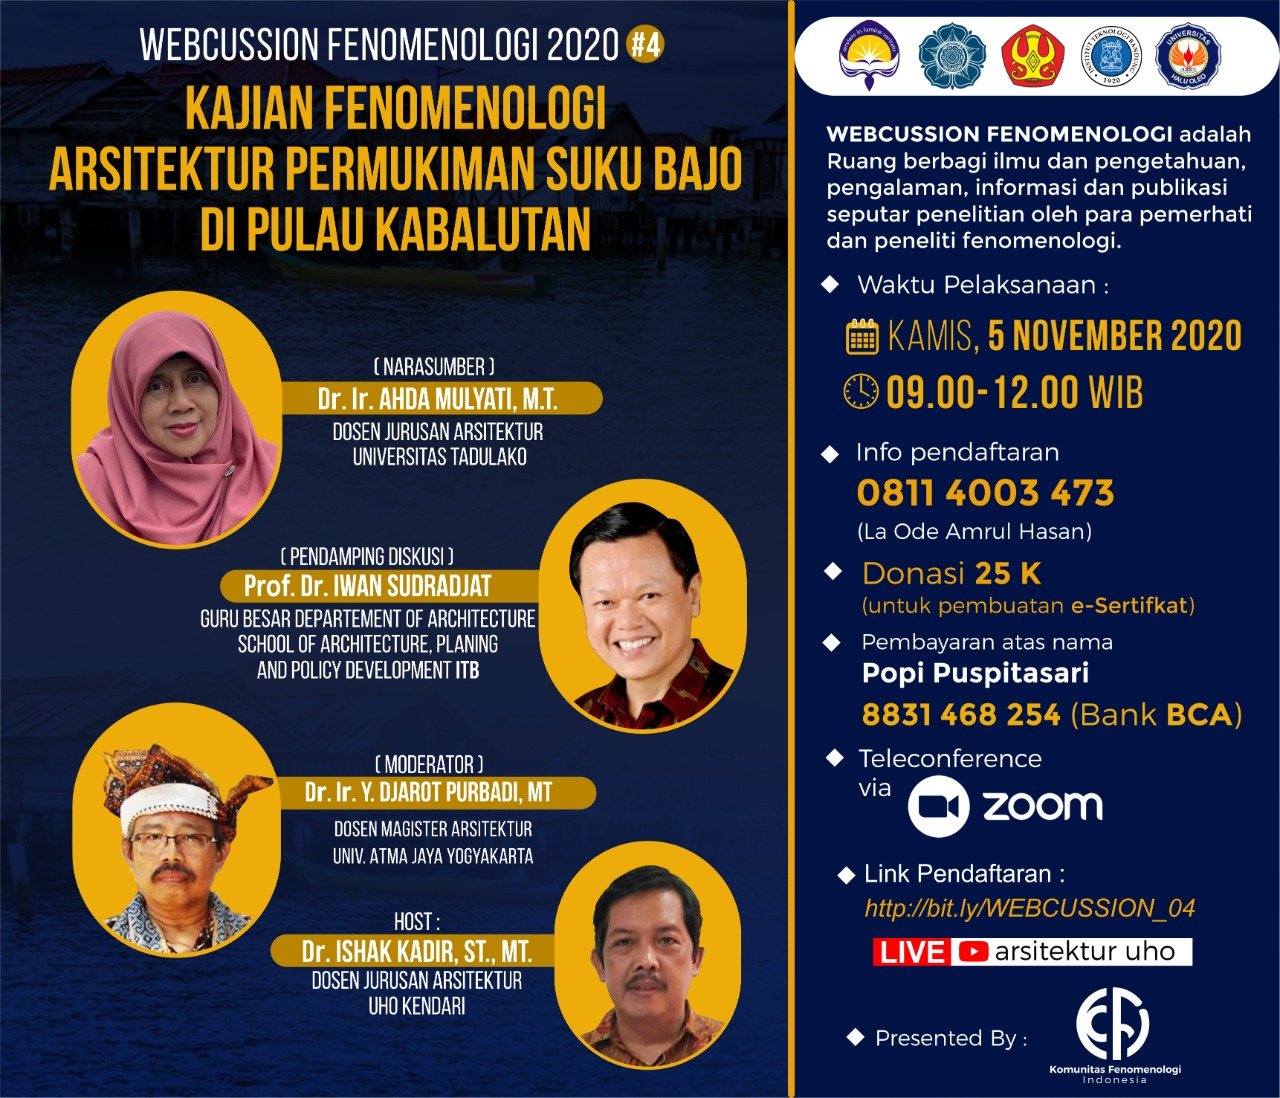 Iwan Sudradjat Menjadi Pendamping Diskusi dalam Webcussion Kajian Fenomenologi Arsitektur Permukiman Suku Bajo di Pulau Kabalutan